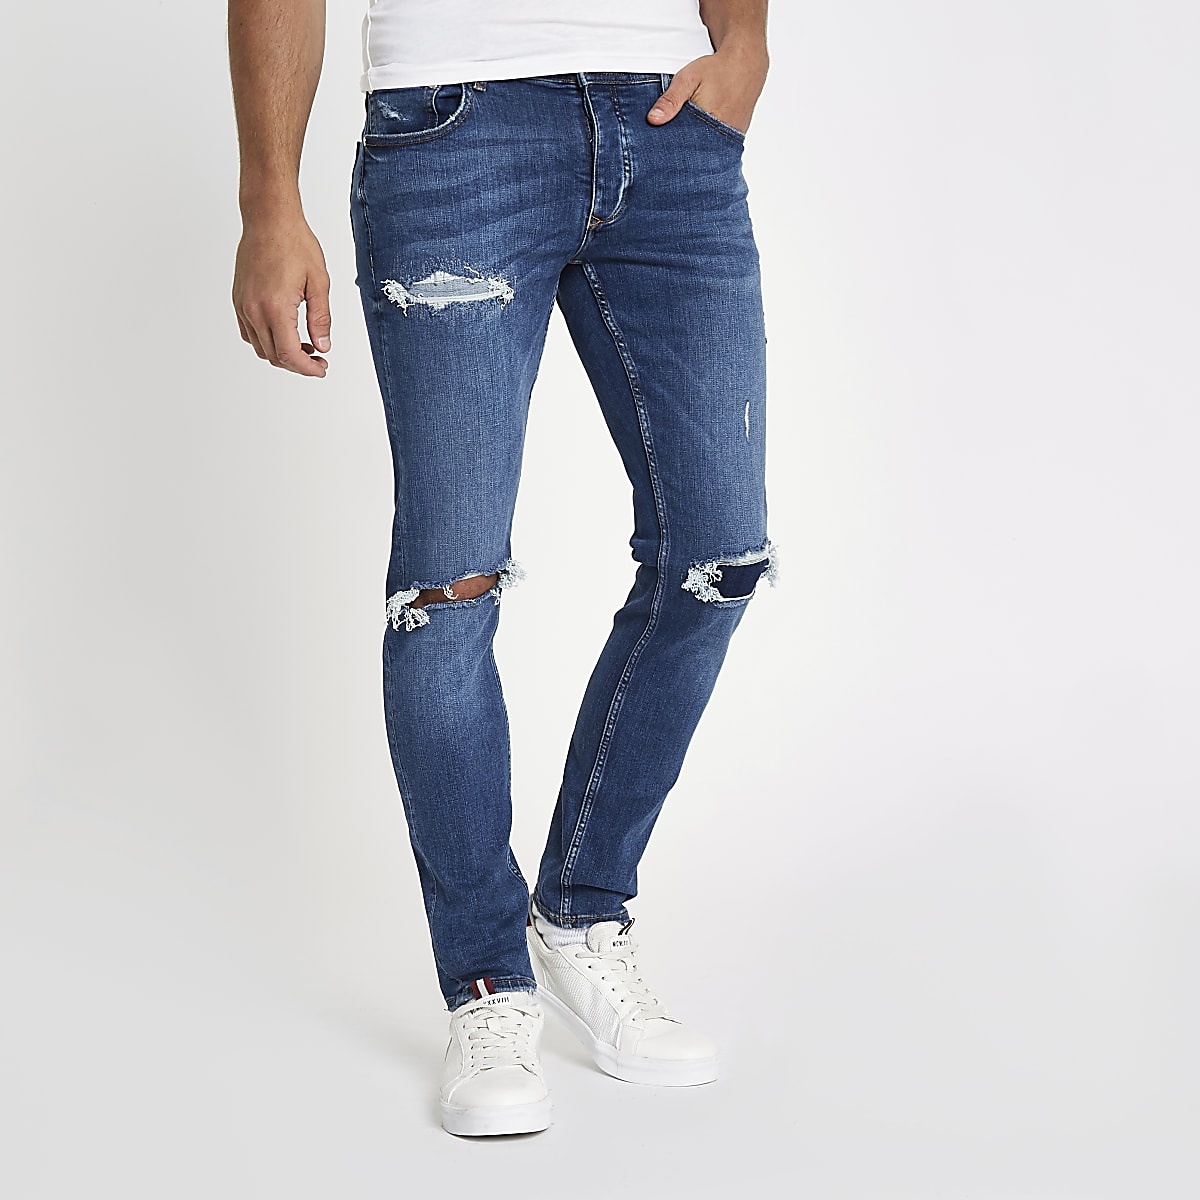 c9cdedf4d5 Blue ripped Sid skinny jeans - Skinny Jeans - Jeans - men